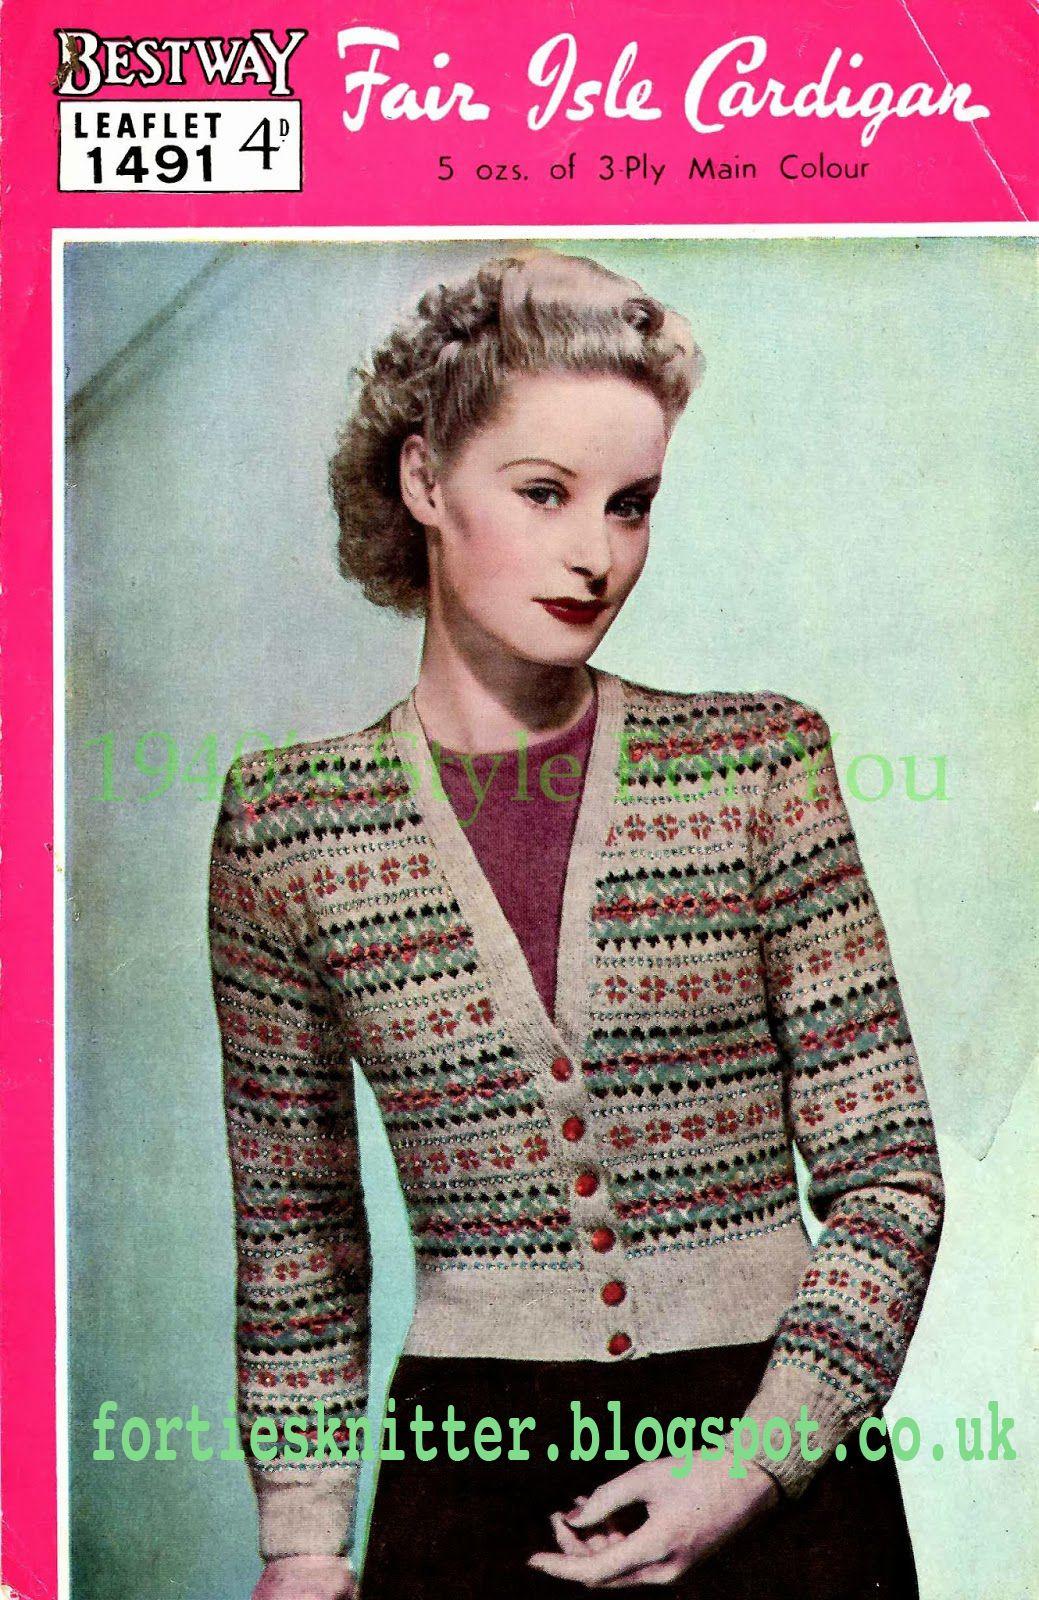 1940s knitting bestway no1491 fair isle cardigan free knitting 1940s knitting bestway no1491 fair isle cardigan free knitting pattern bankloansurffo Choice Image